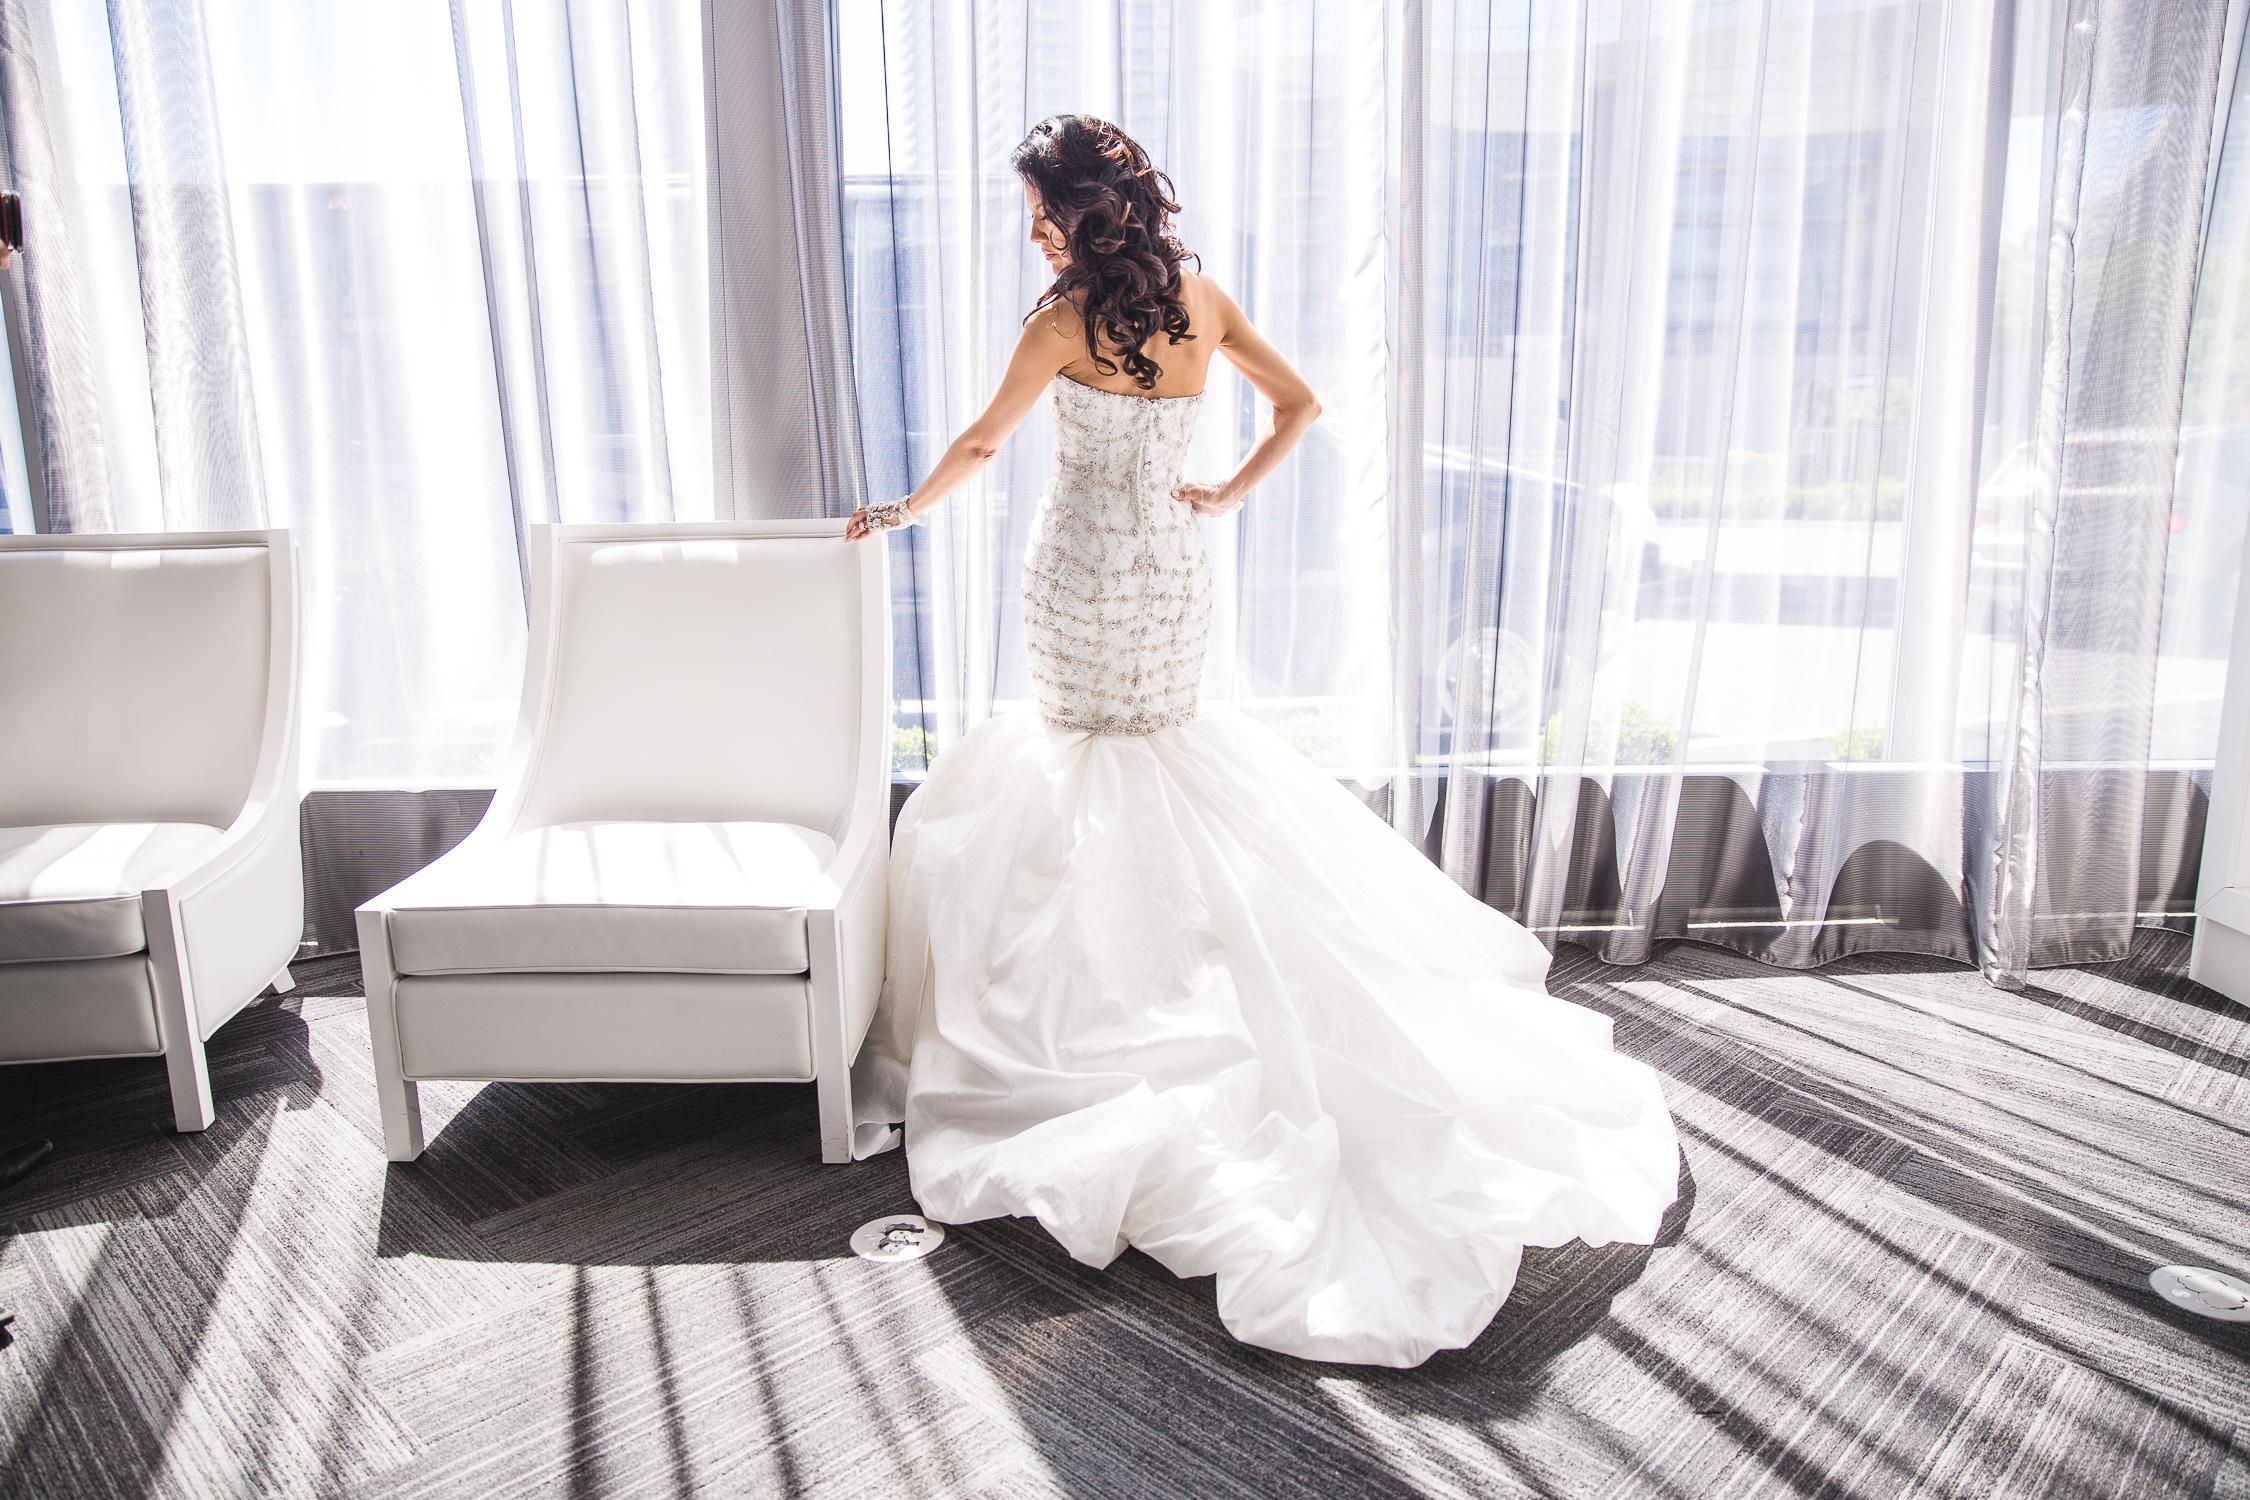 Paradise-Banquet-Hall-Wedding-Vaughan-Ontario-0008.jpg